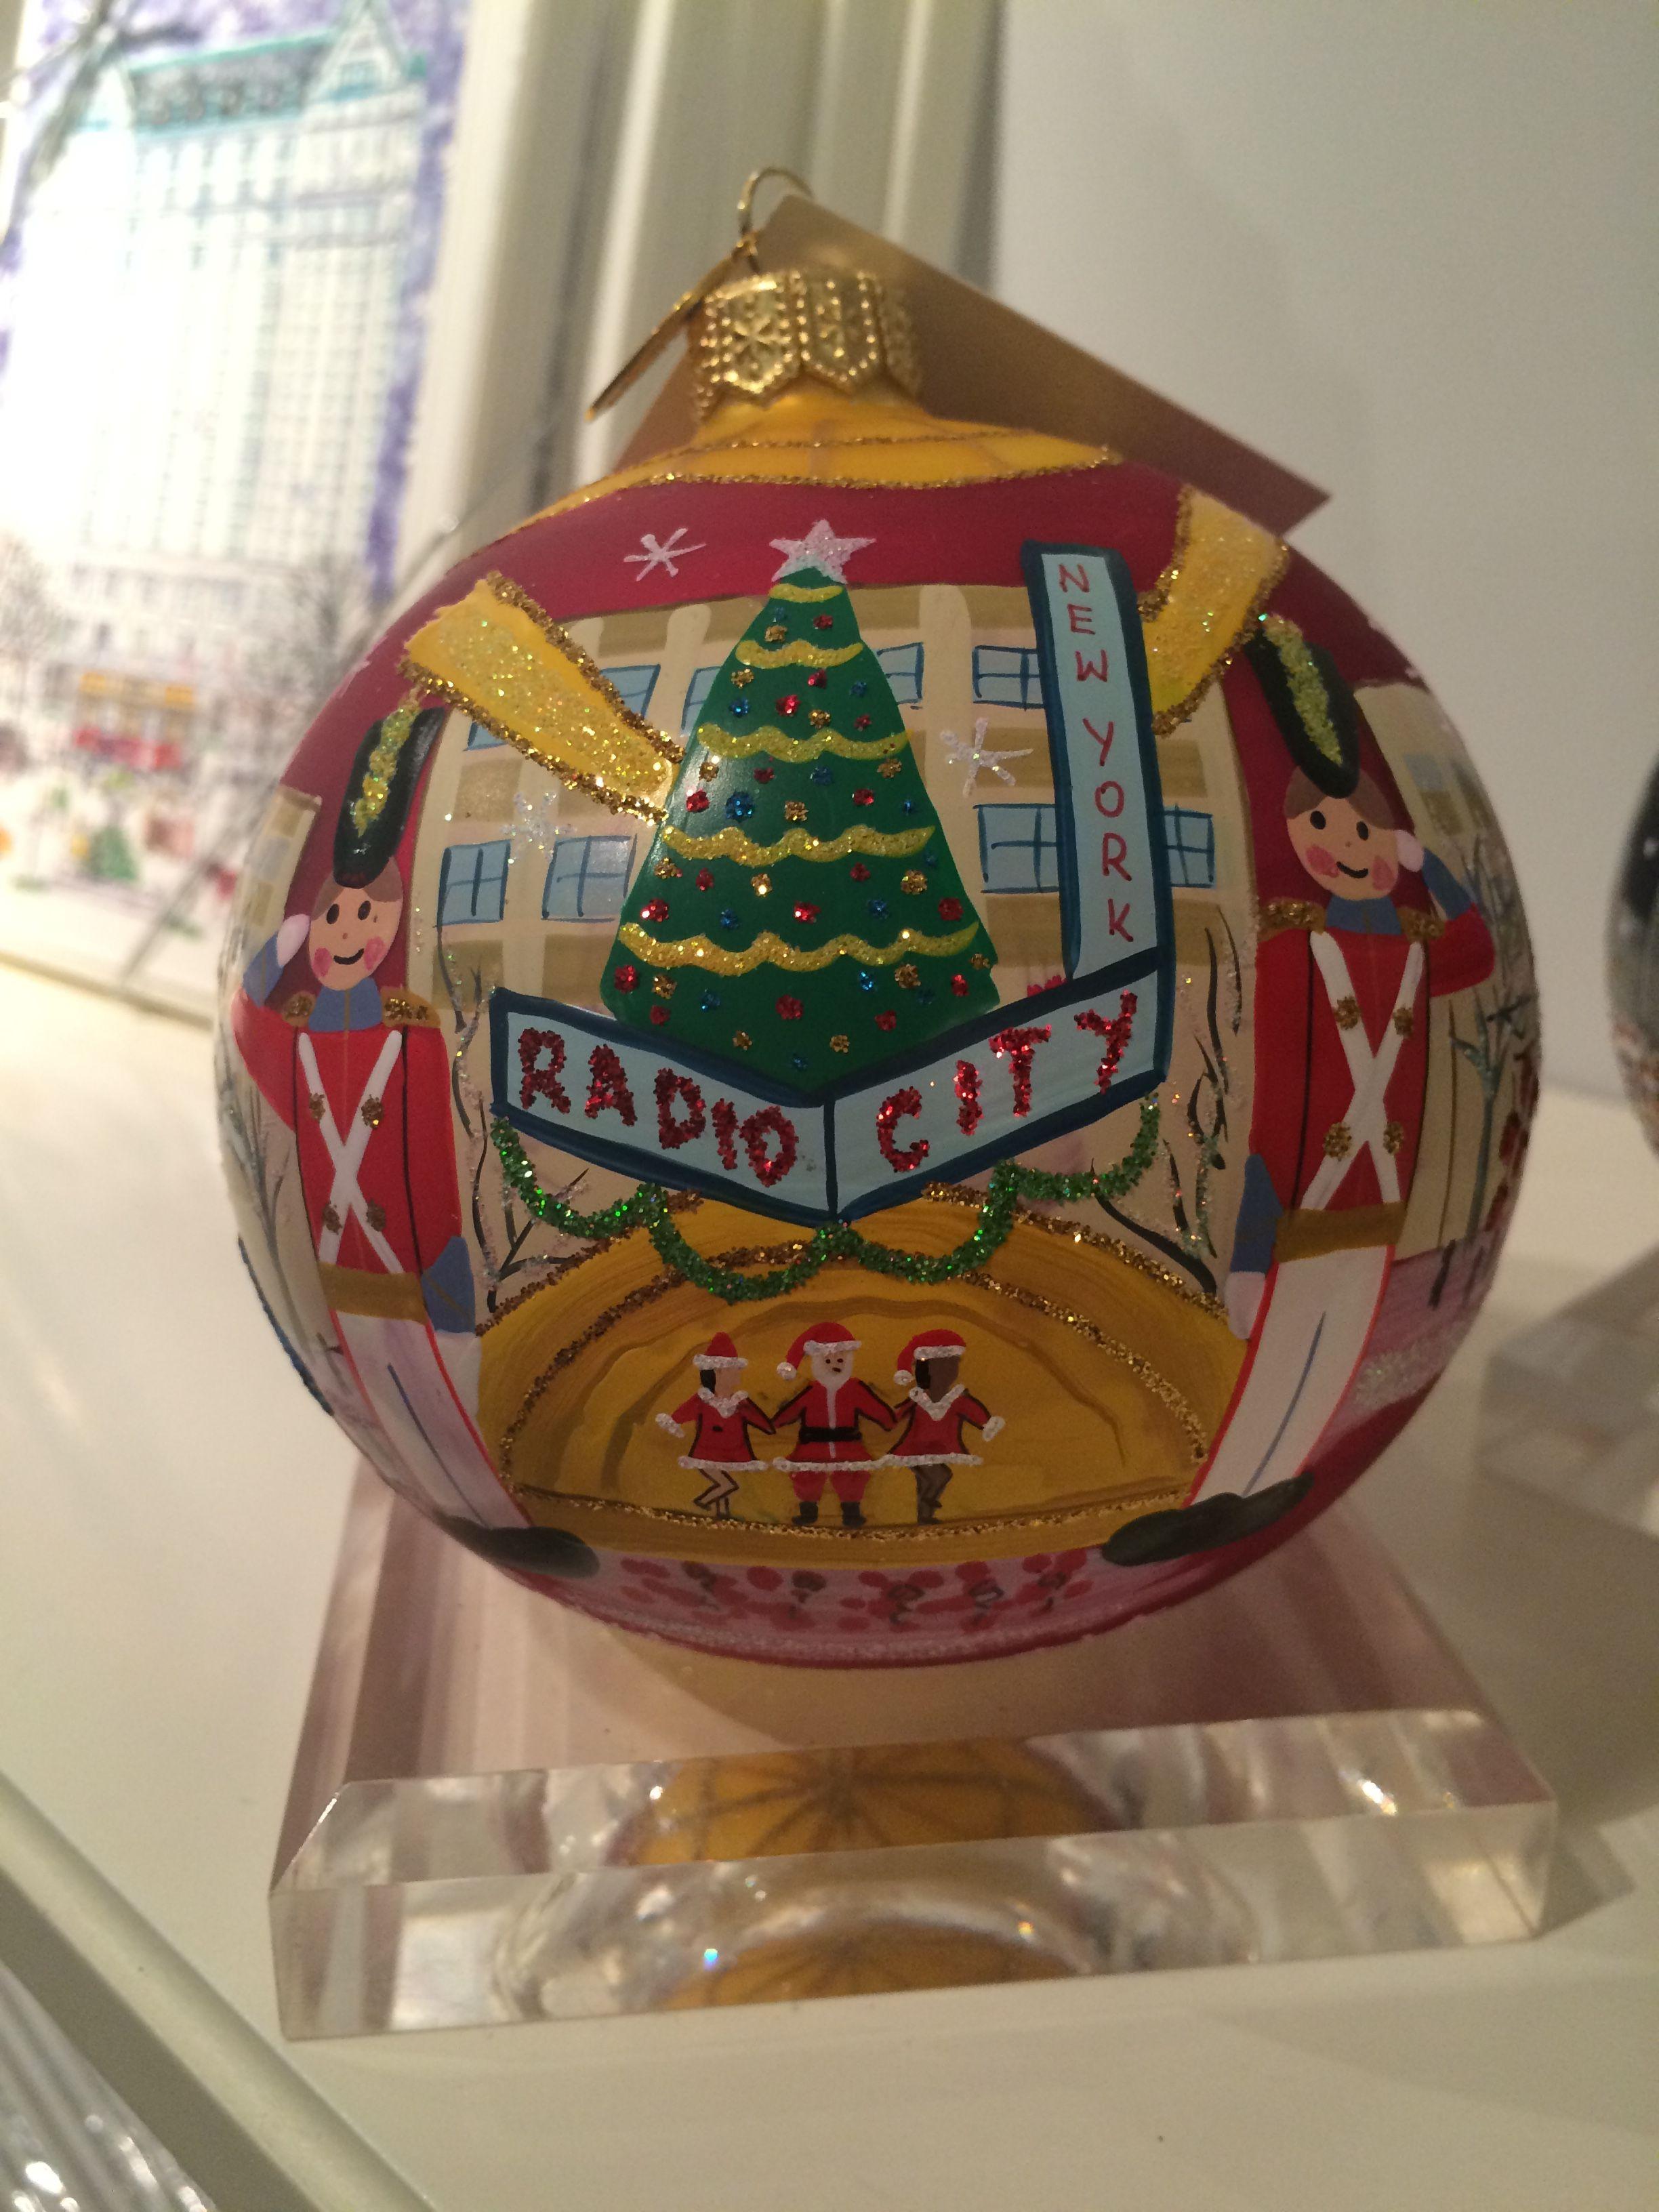 My Rockefeller Center Ornament #Christmas #ornament #NY4Seasons #nyc ...